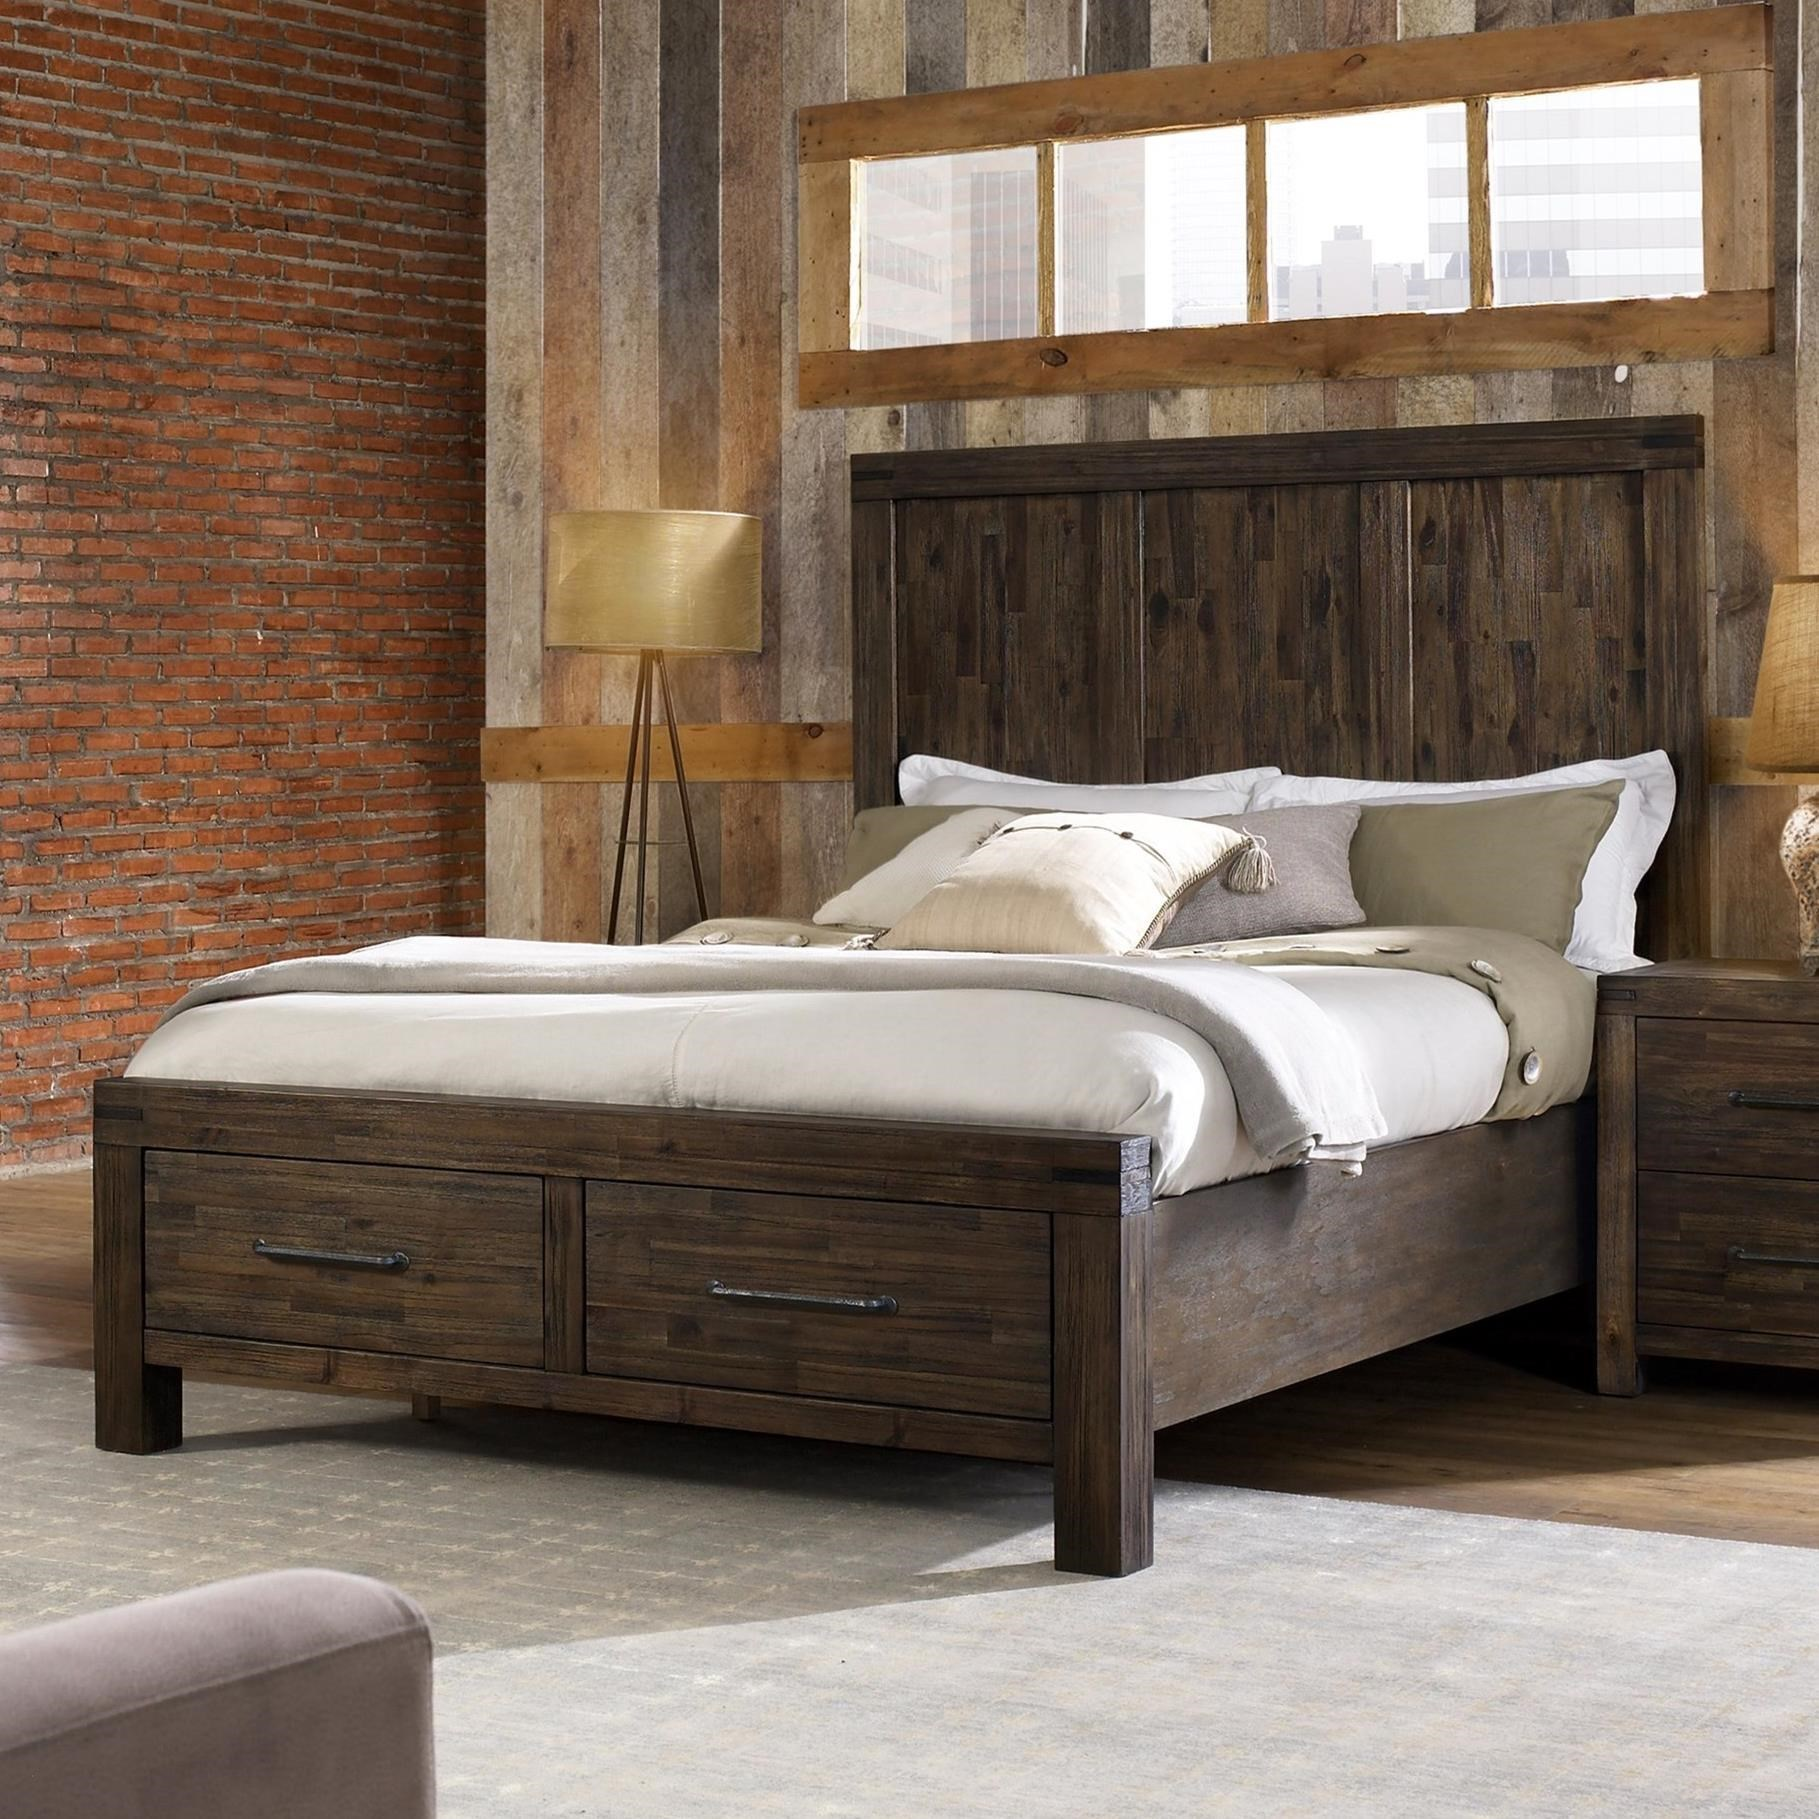 Genial Hillsdale Gannon Modern Queen Bed With Footboard Storage